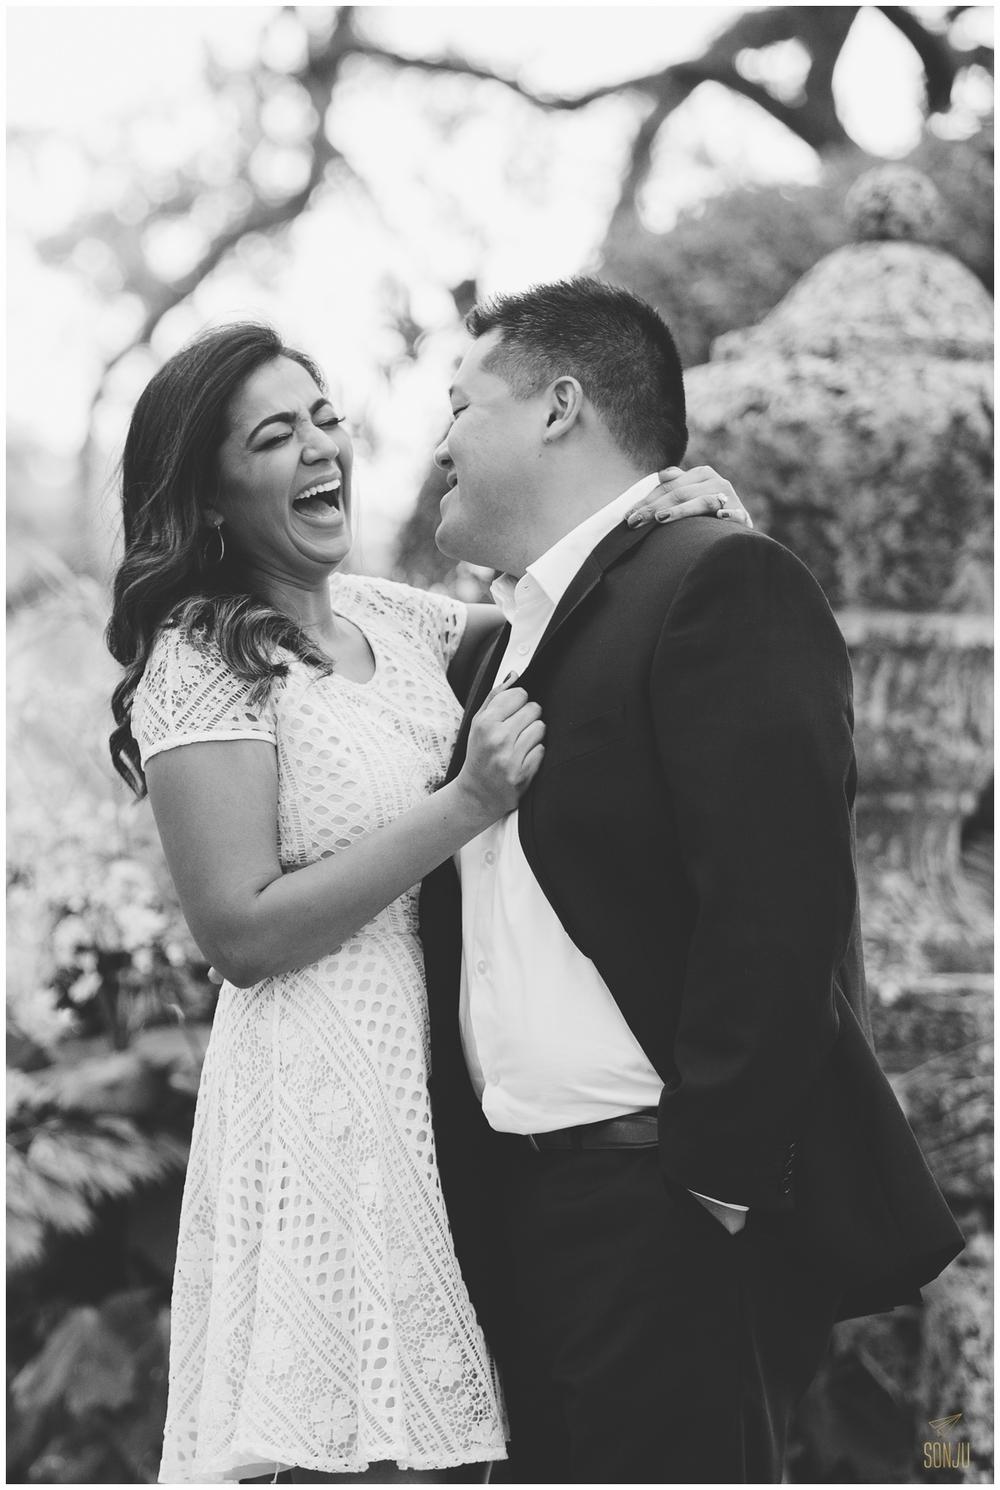 Engagement-session-vizcaya-miami-wedding-photographer-sonju00006.jpg